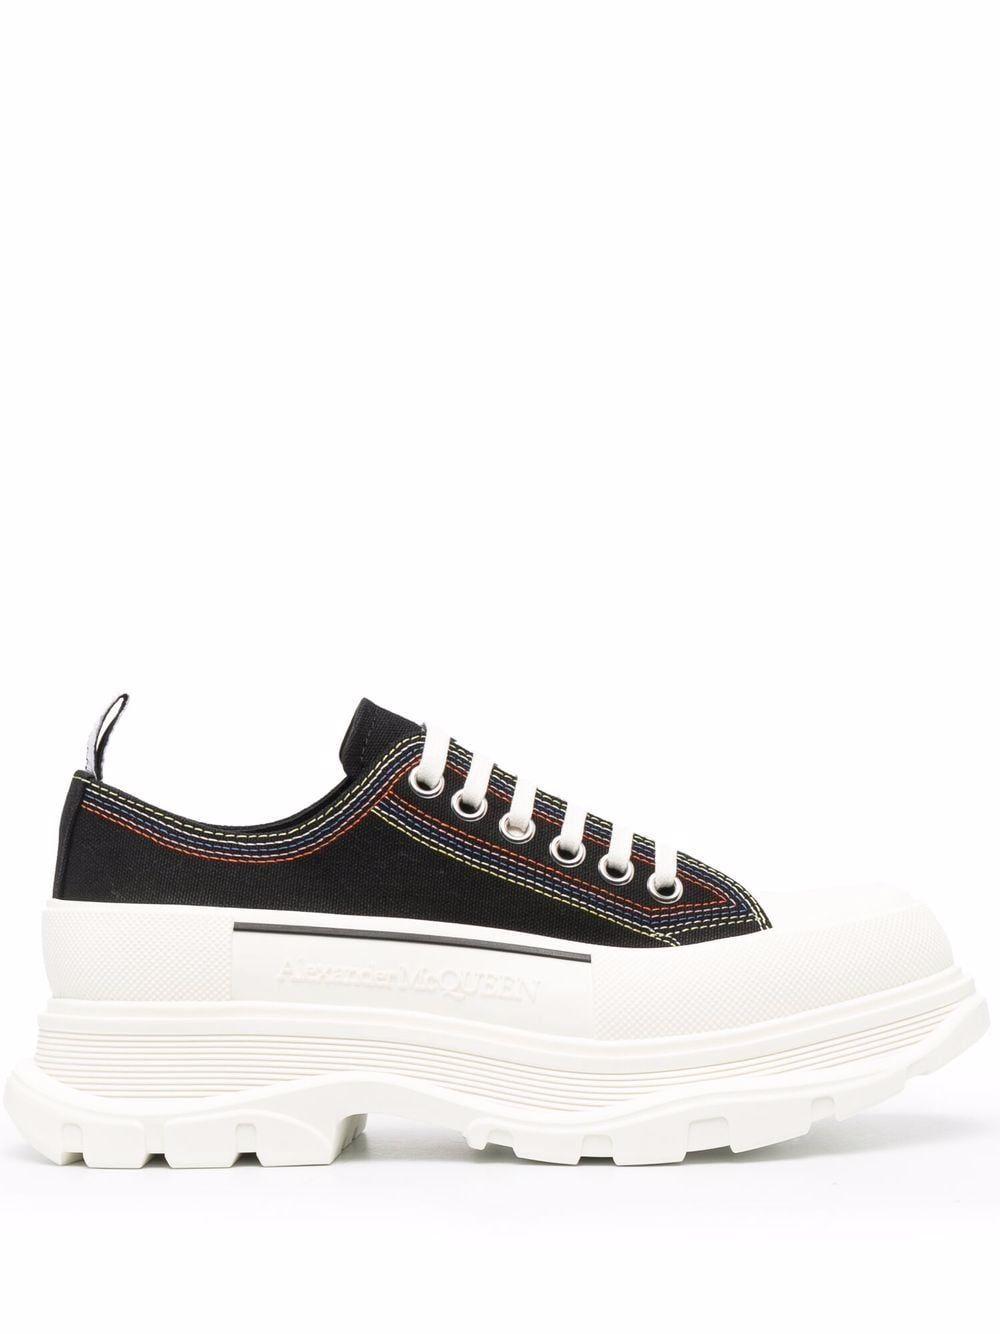 Sneaker tread slick